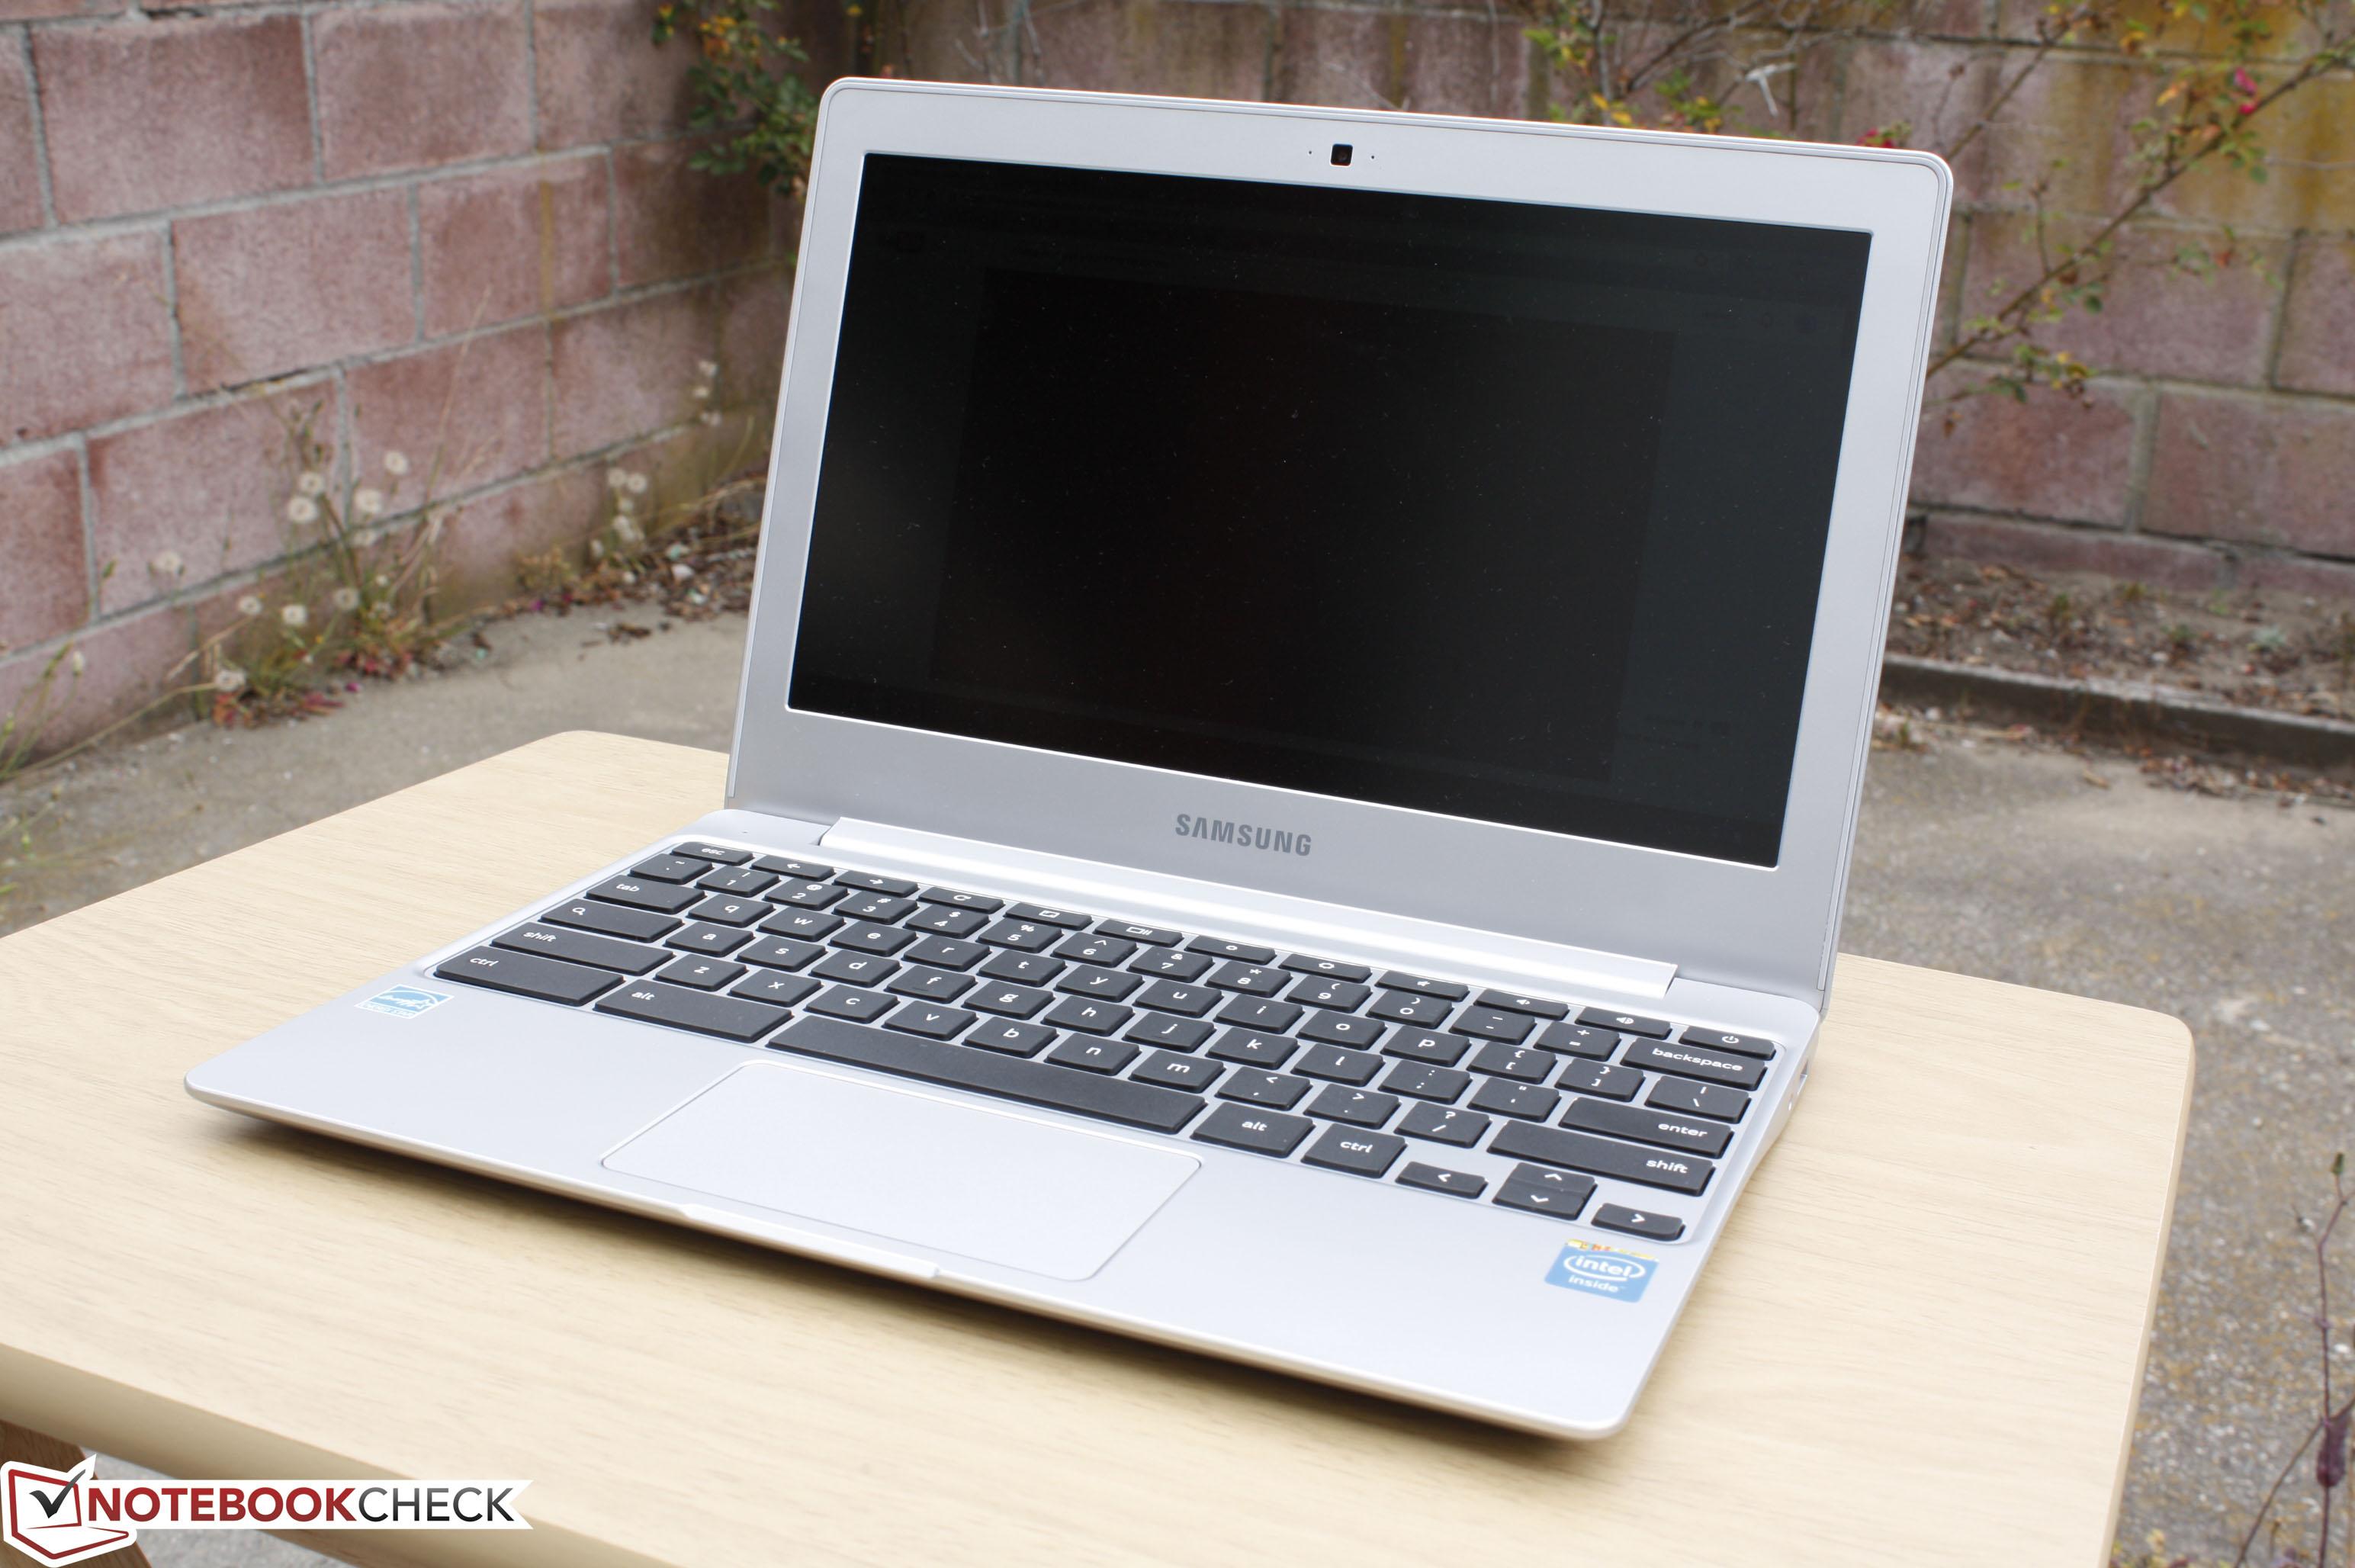 Samsung Chromebook 2 (XE500C12) Notebook Review